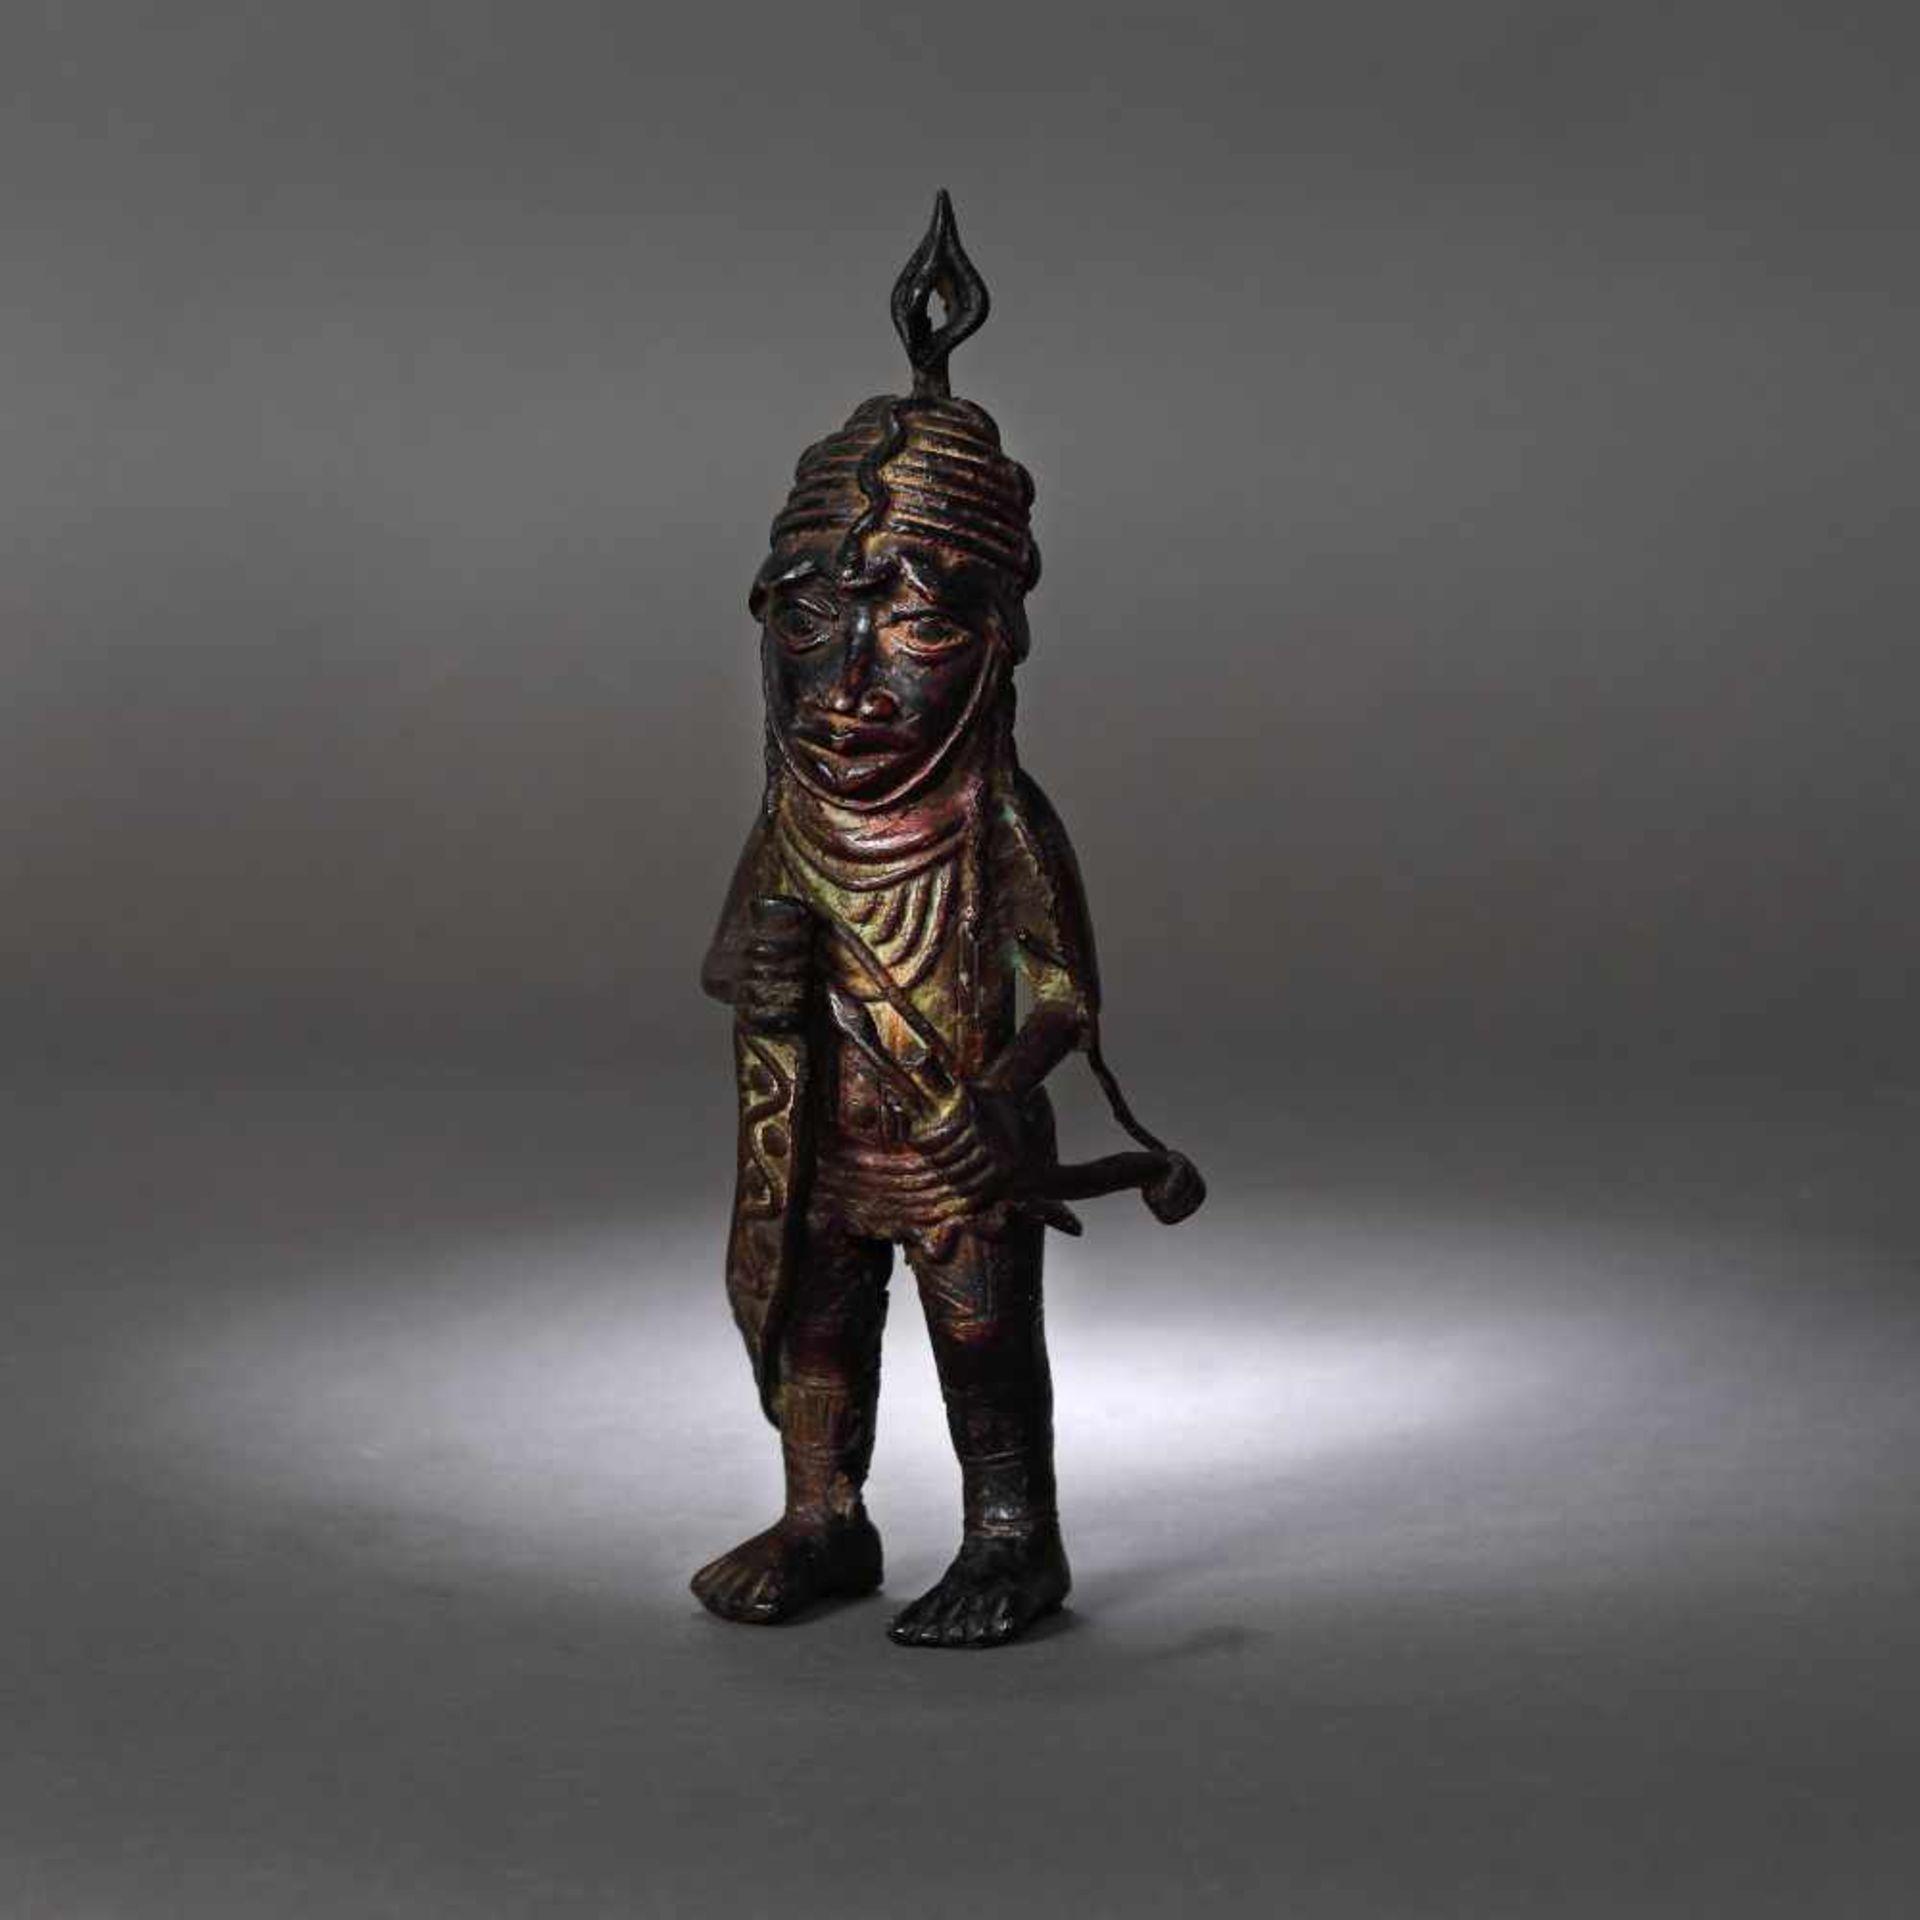 Bronze statuette, representing a warrior, possibly Nigeria, early 20th century - Bild 2 aus 4